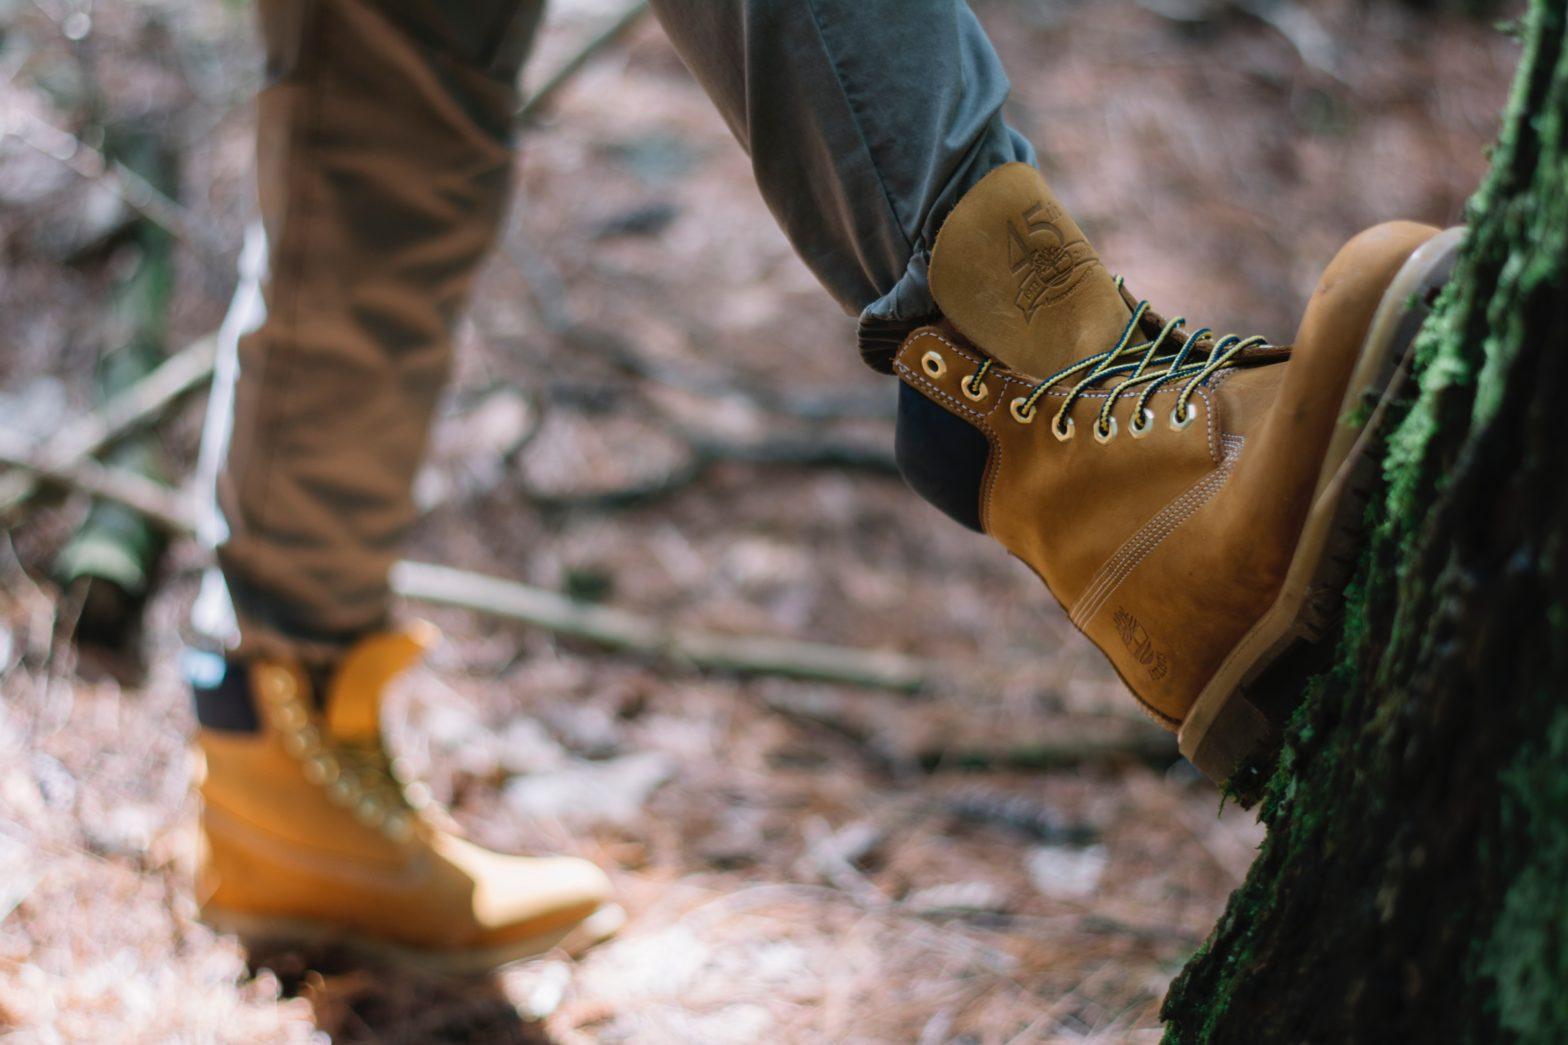 Pulire le scarpe Timberland e Ugg